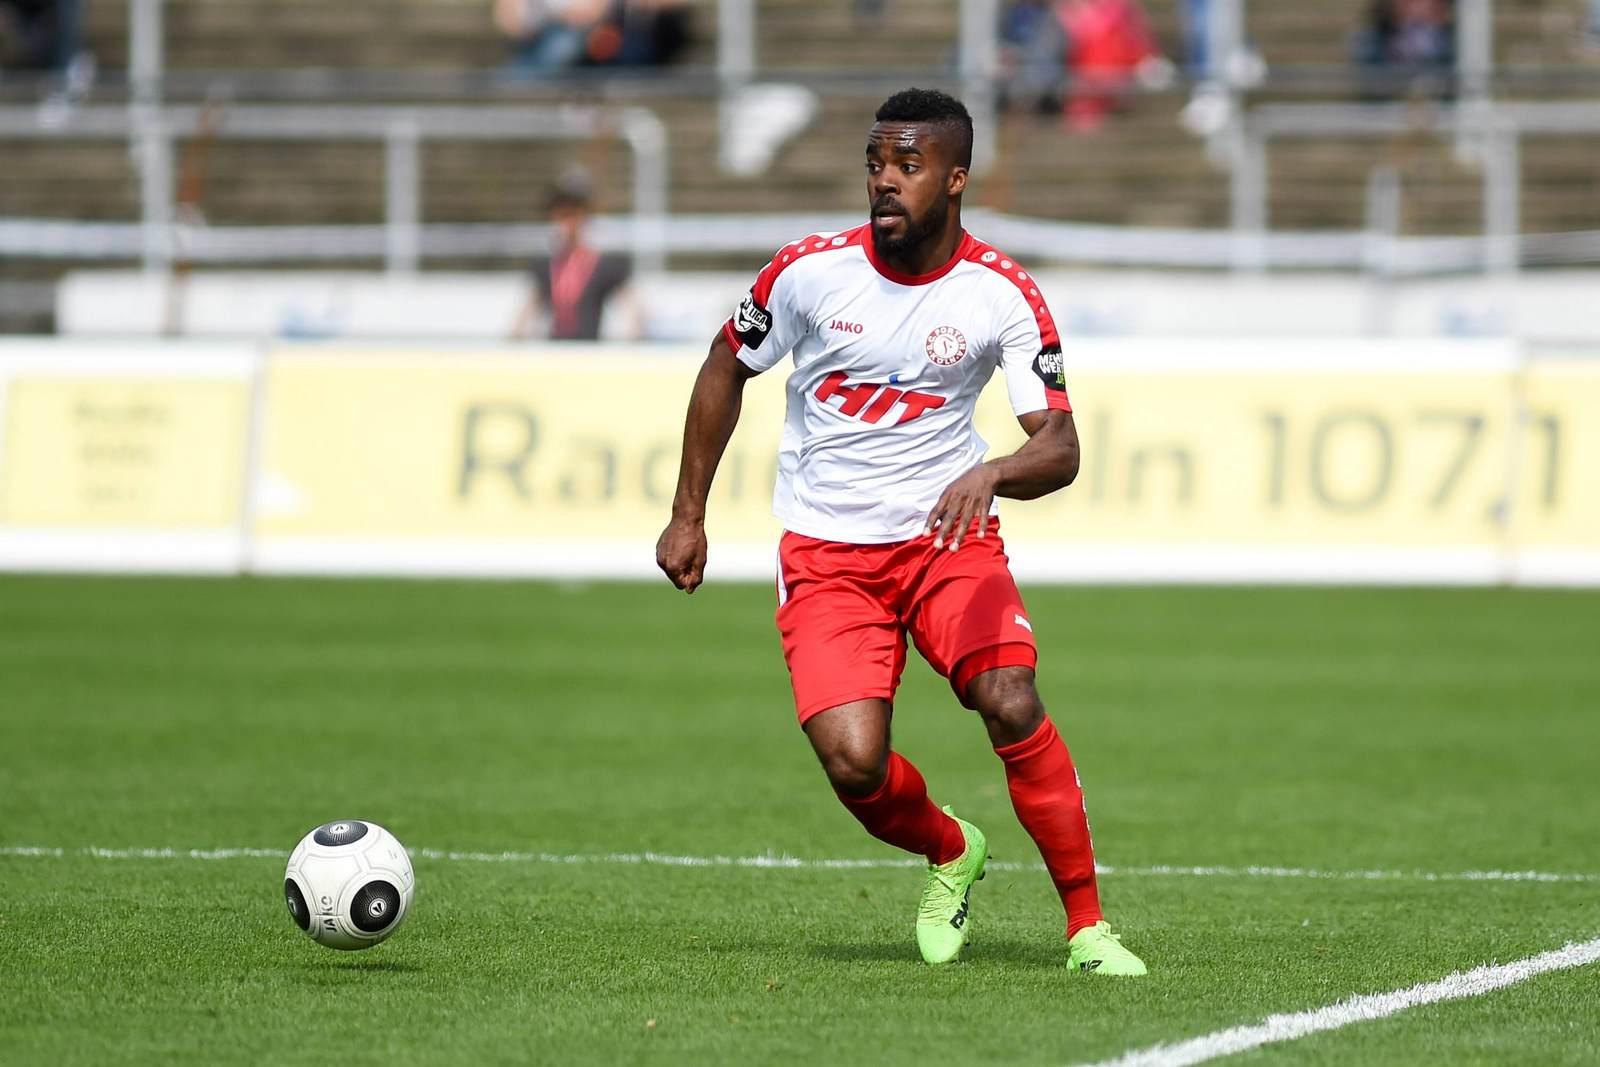 Kusi Kwame im Trikot von Fortuna Köln am Ball